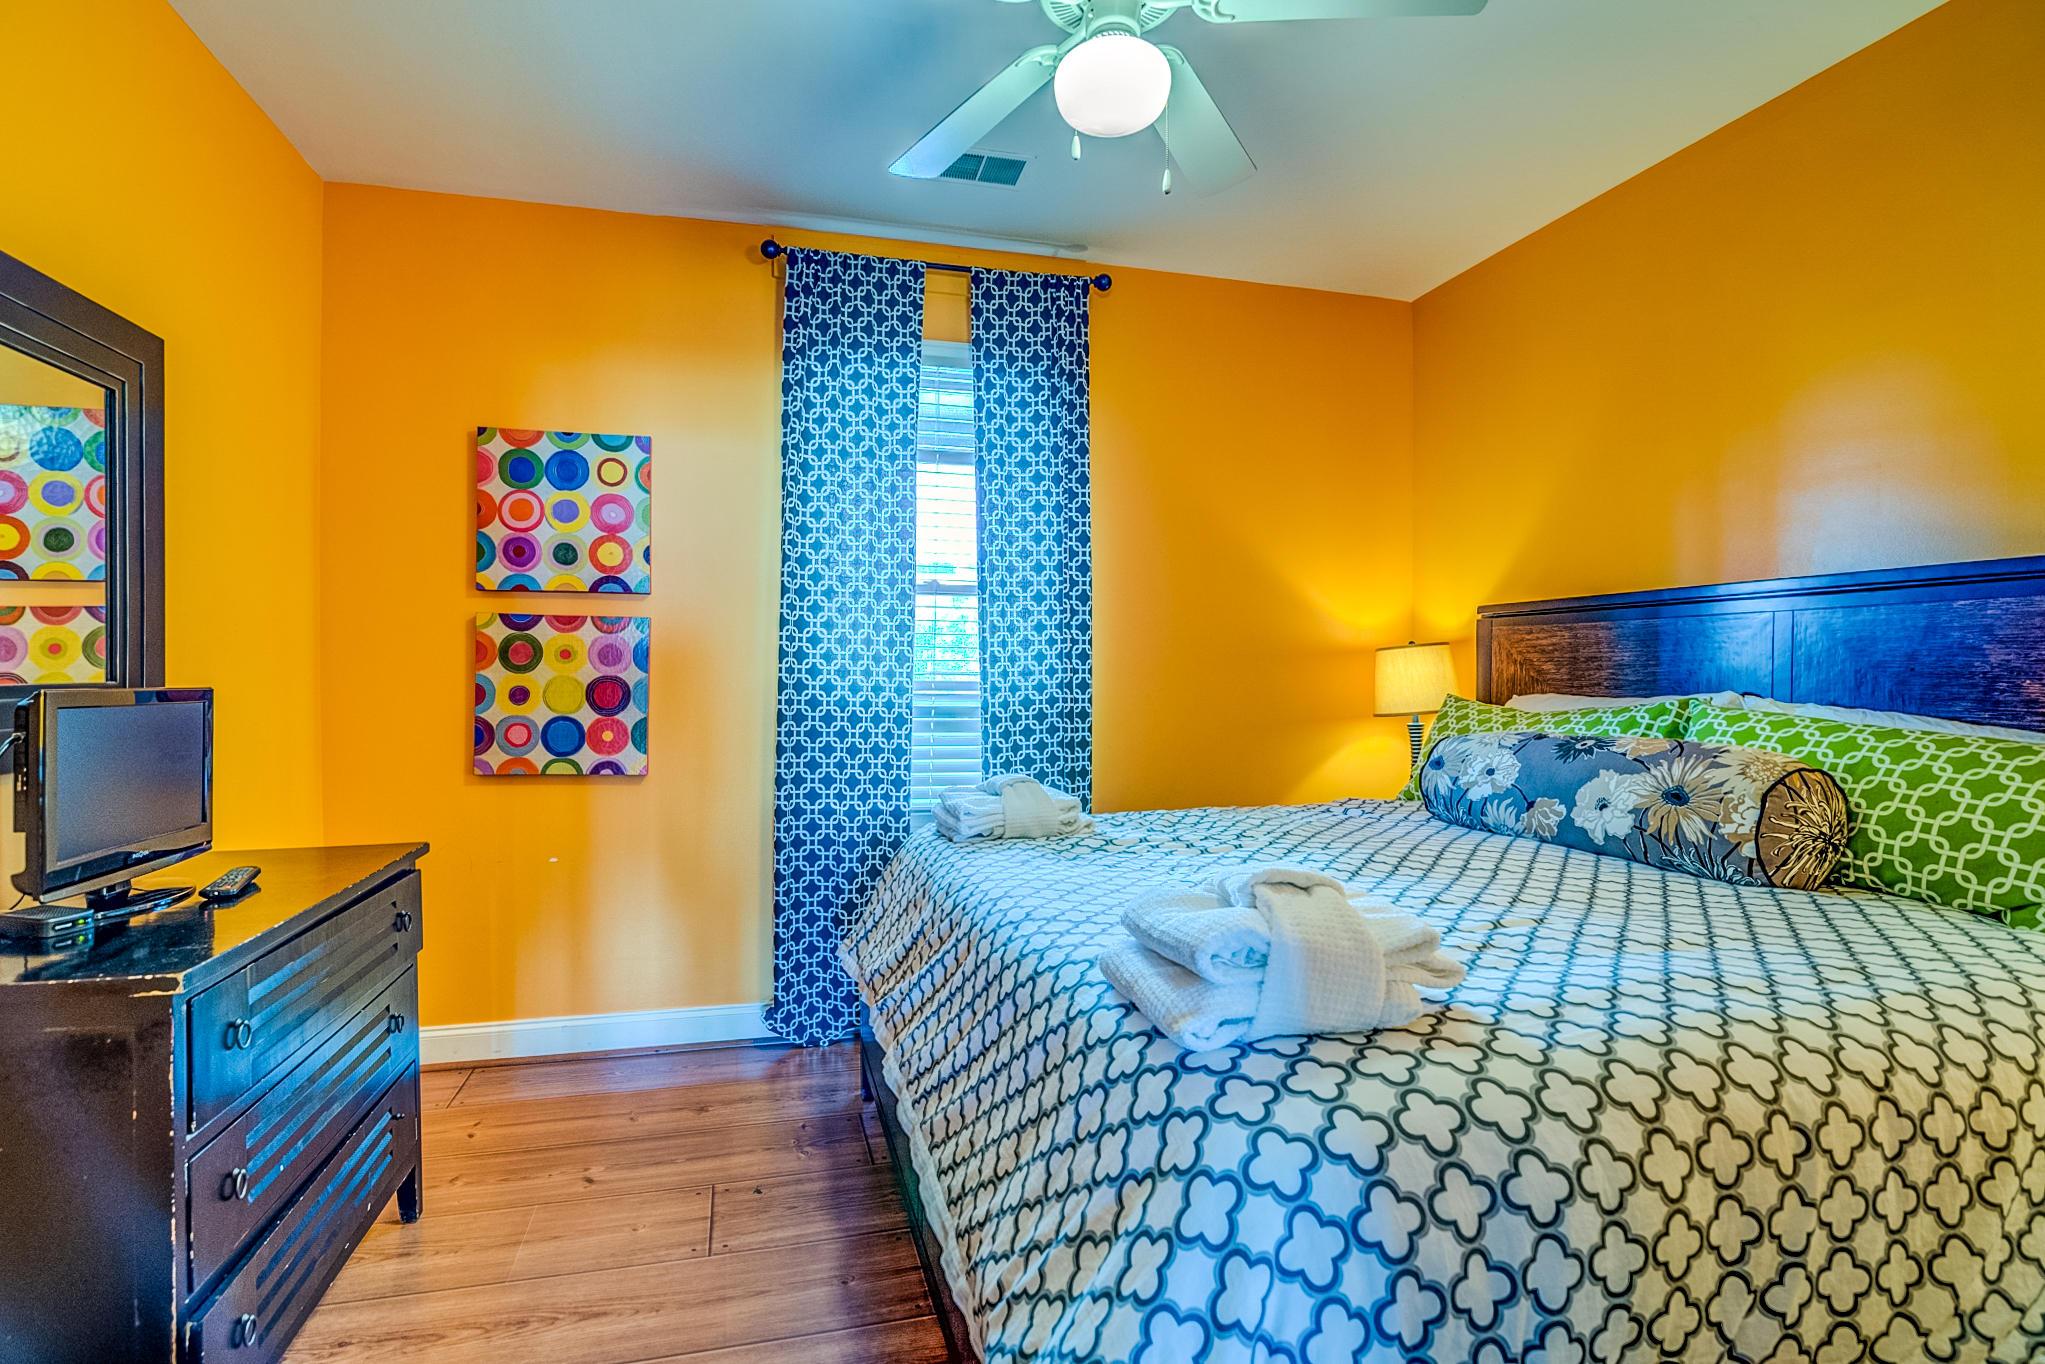 Ocean Pointe Villas Homes For Sale - 214 Arctic, Folly Beach, SC - 2